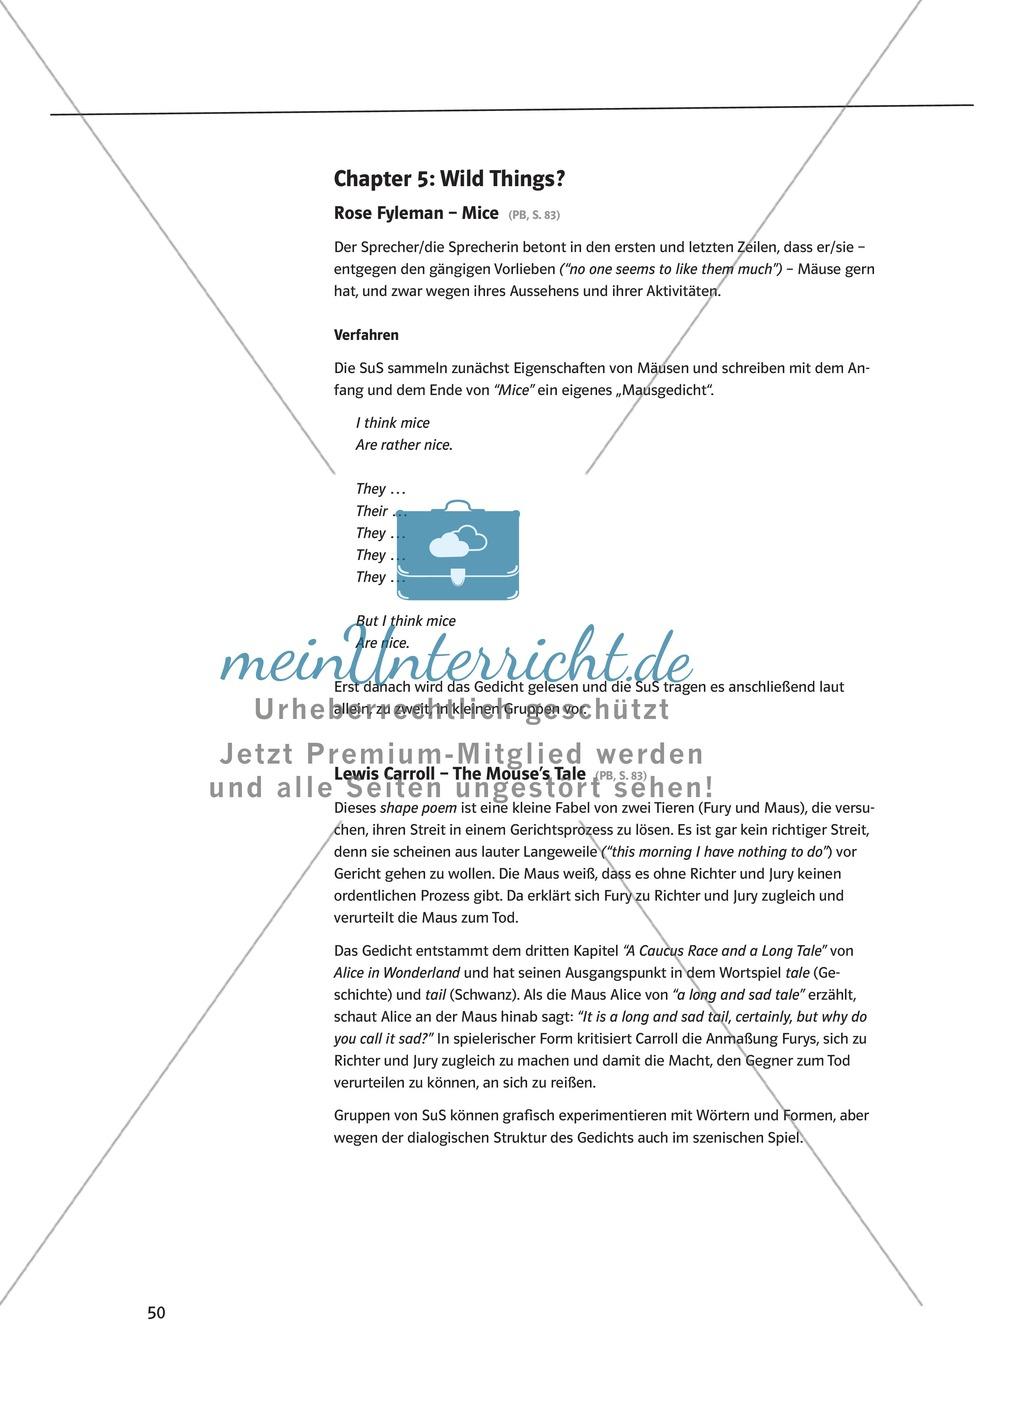 The Poetry Box: Wild Things? Beispiele + Lernziele + Verfahren + Arbeitsblätter Preview 0